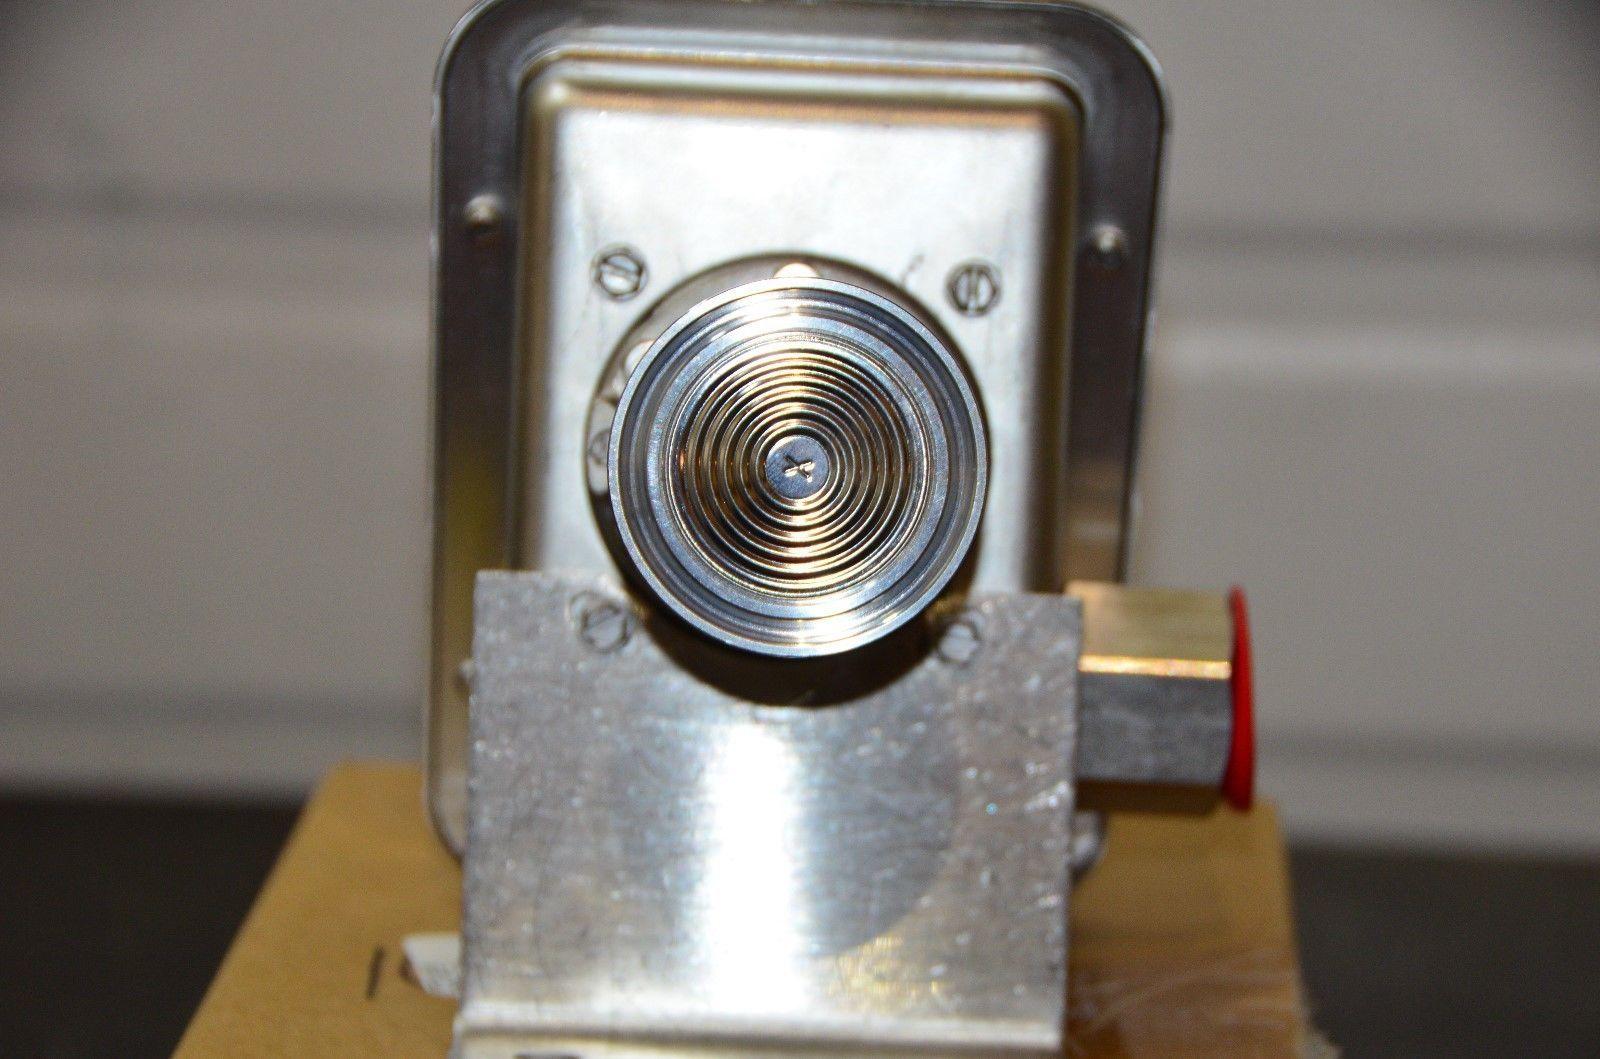 labtechsales 1609-002-00 Flapper Valve Buna N for AMT 3 Diaphragm Pump//New NOS